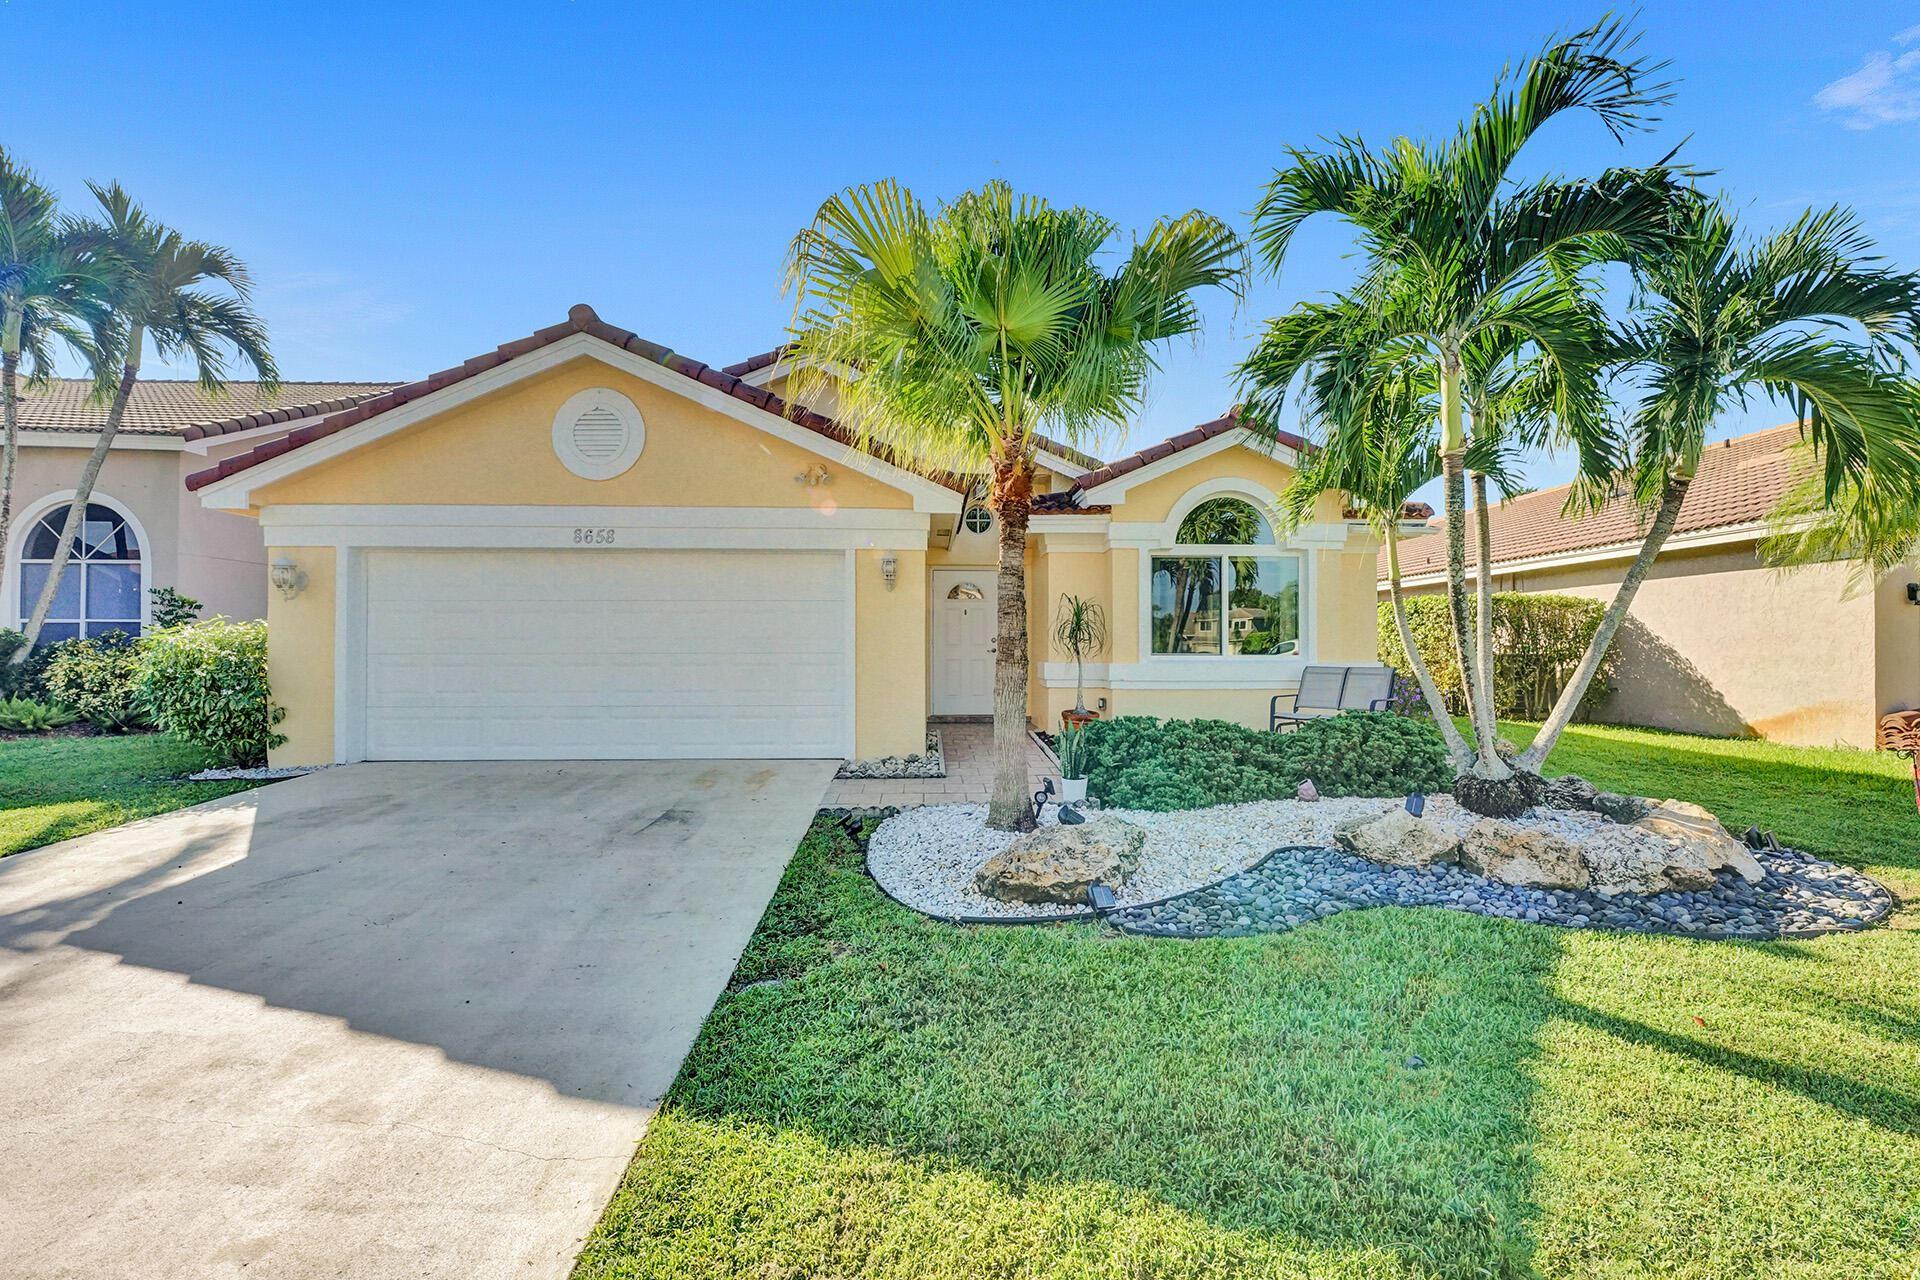 8658 Tourmaline Boulevard, Boynton Beach, FL 33472 - MLS#: RX-10744307